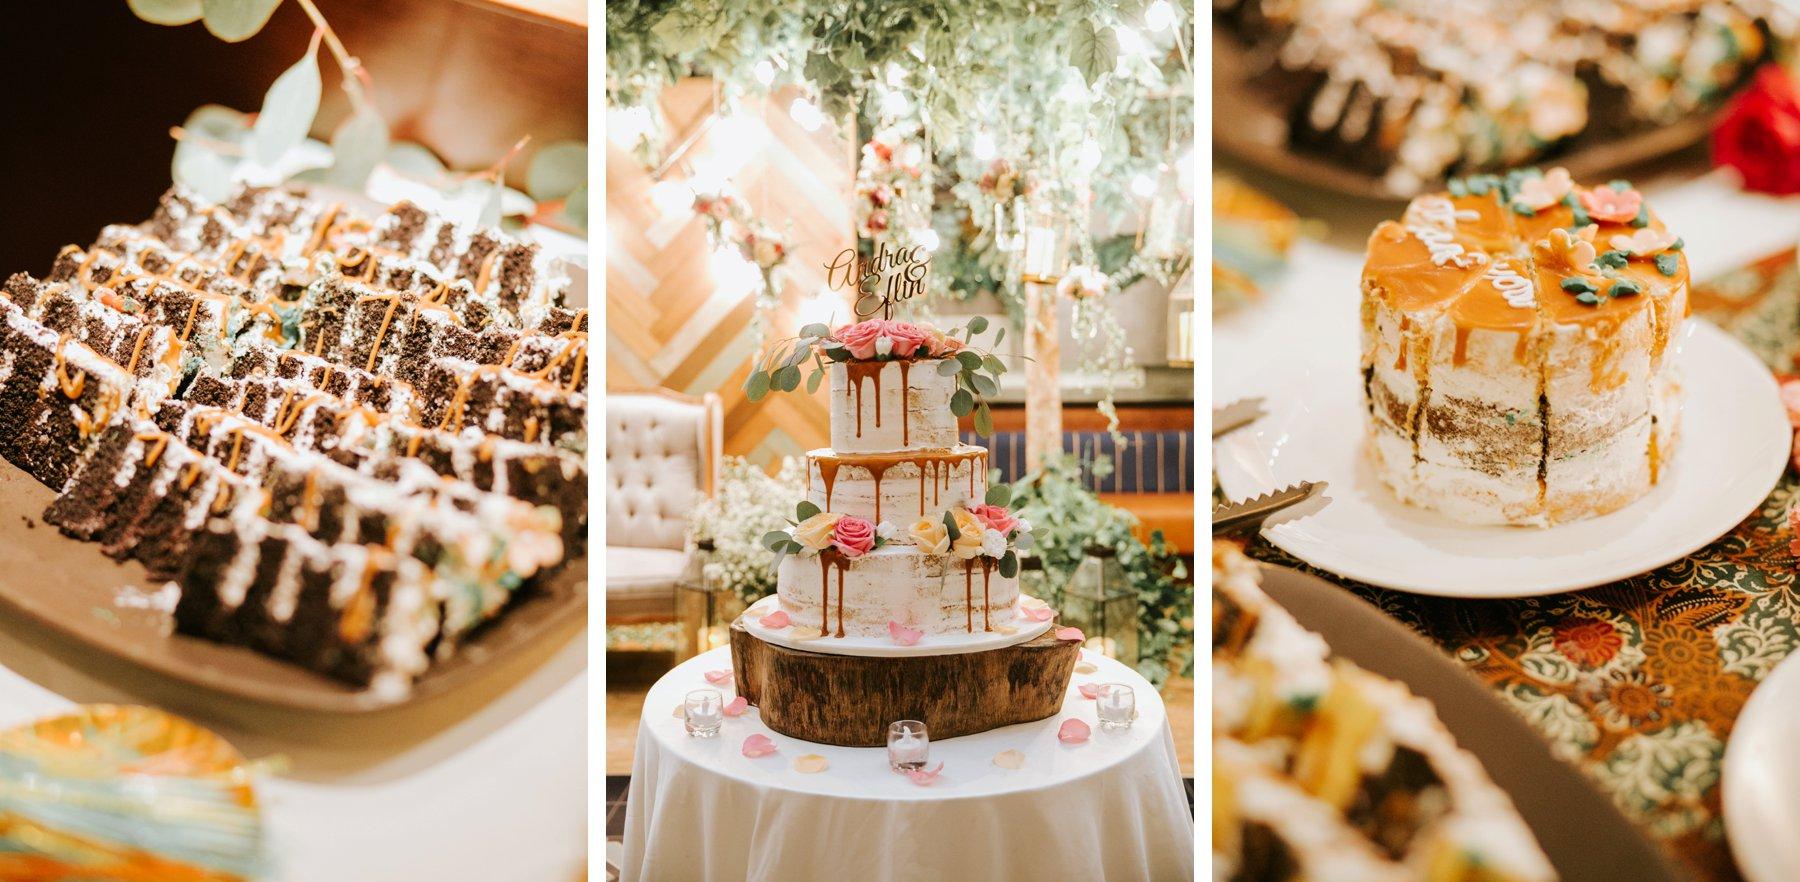 Penang_Bistro_Jakarta_Wedding_0043a